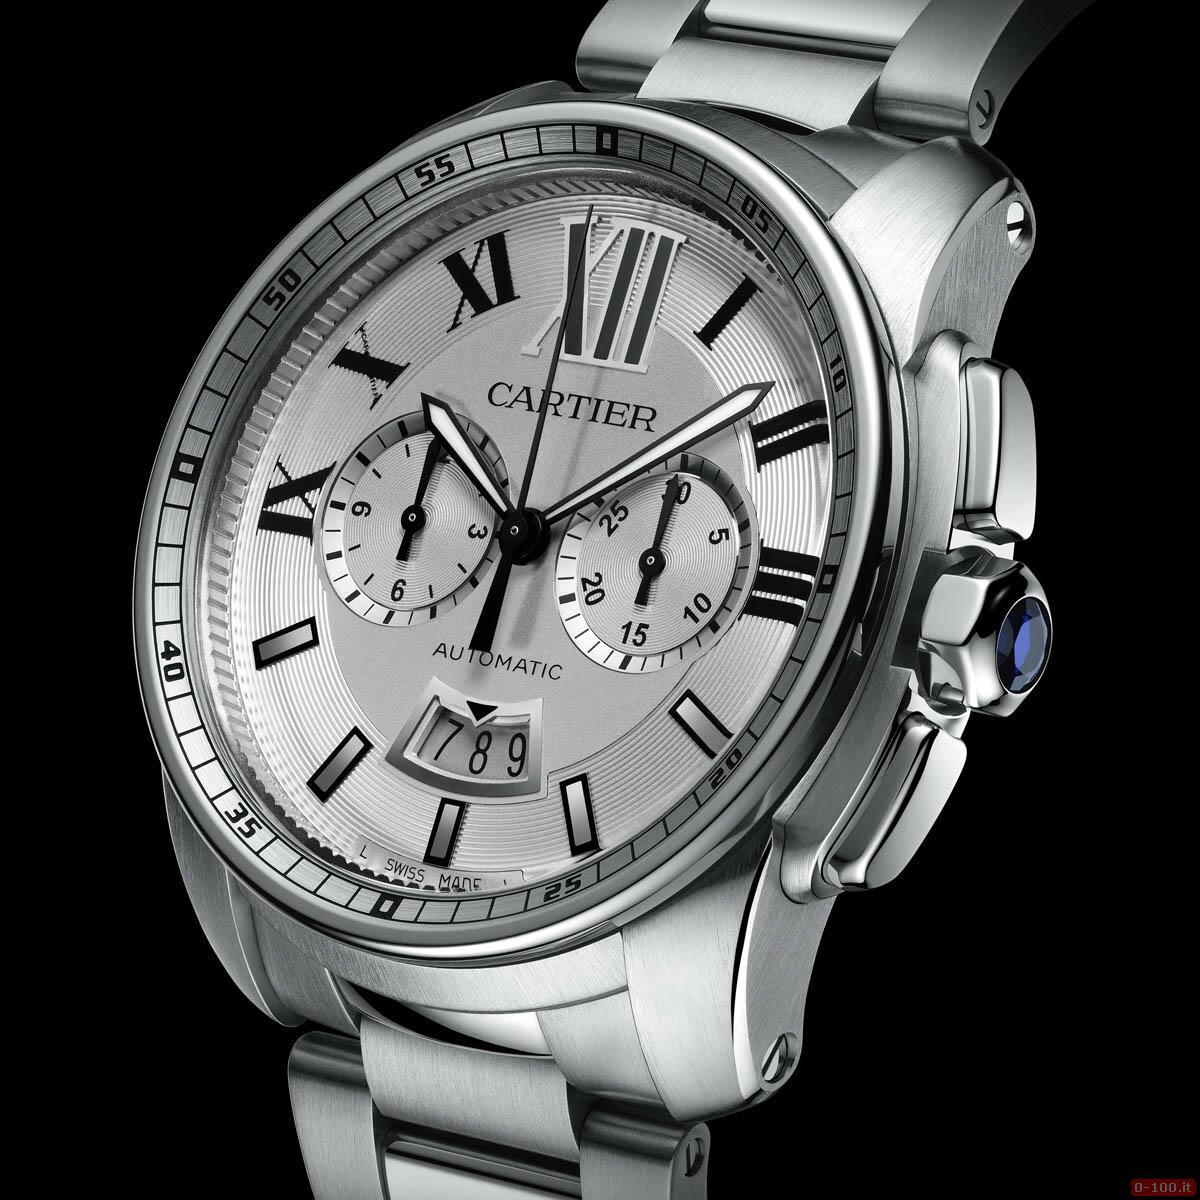 Cartier Calibre Chronograph Watch _0-1006